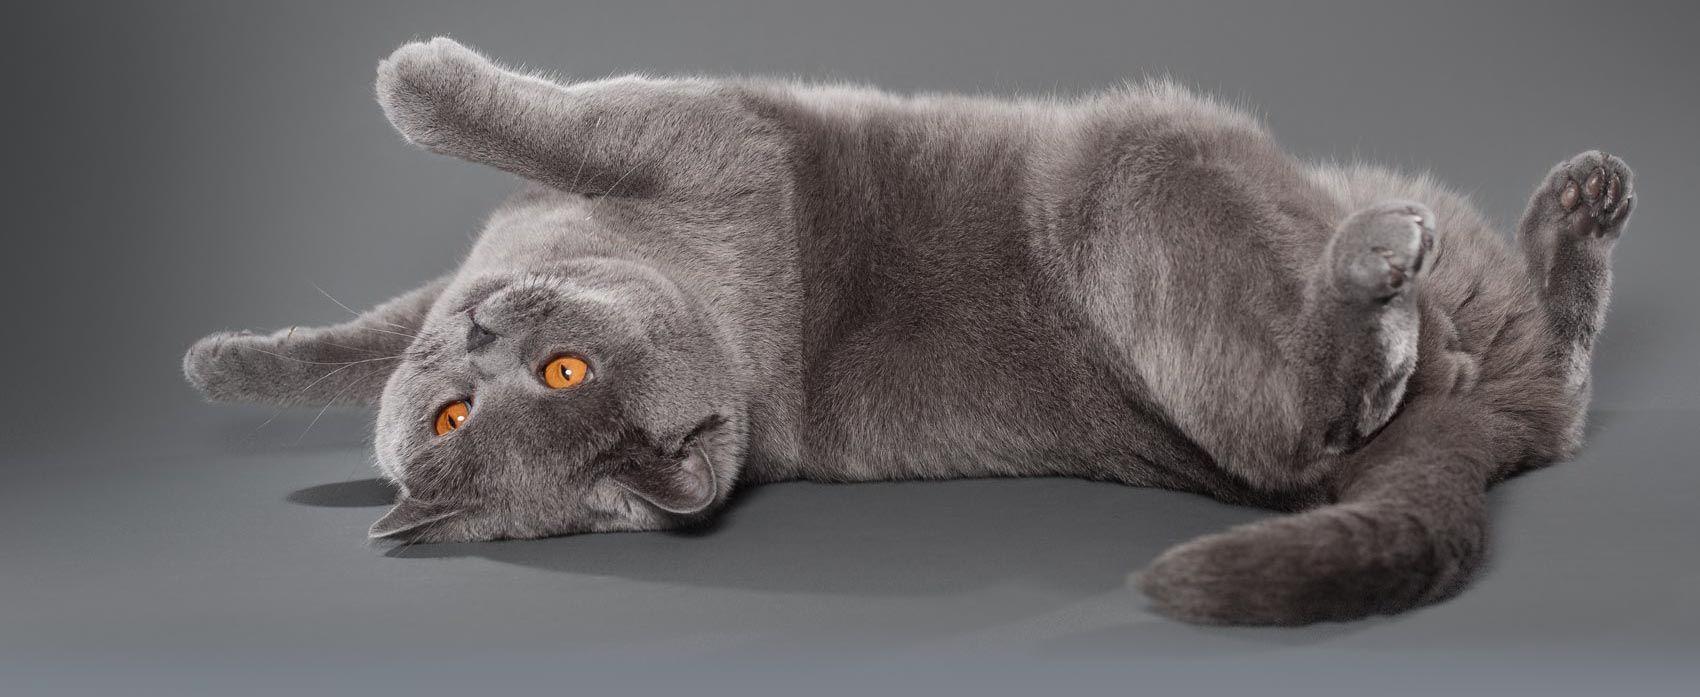 Charakter Der Britisch Kurzhaar Katze Kurzhaar Katzen Britisch